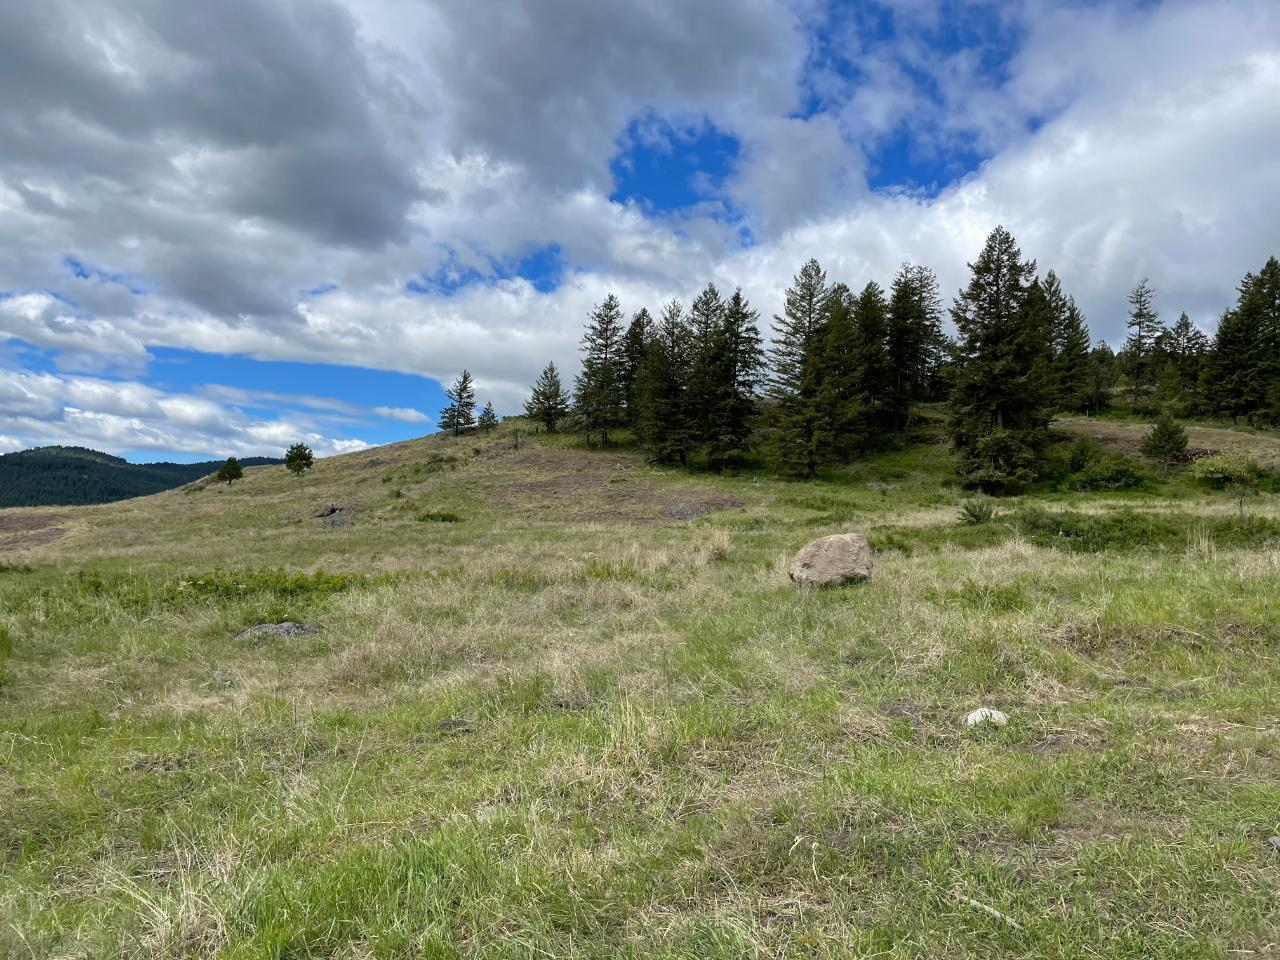 4685 Hwy 3,, Rock Creek/bridesville, British Columbia  V0H 1Y0 - Photo 57 - 189734